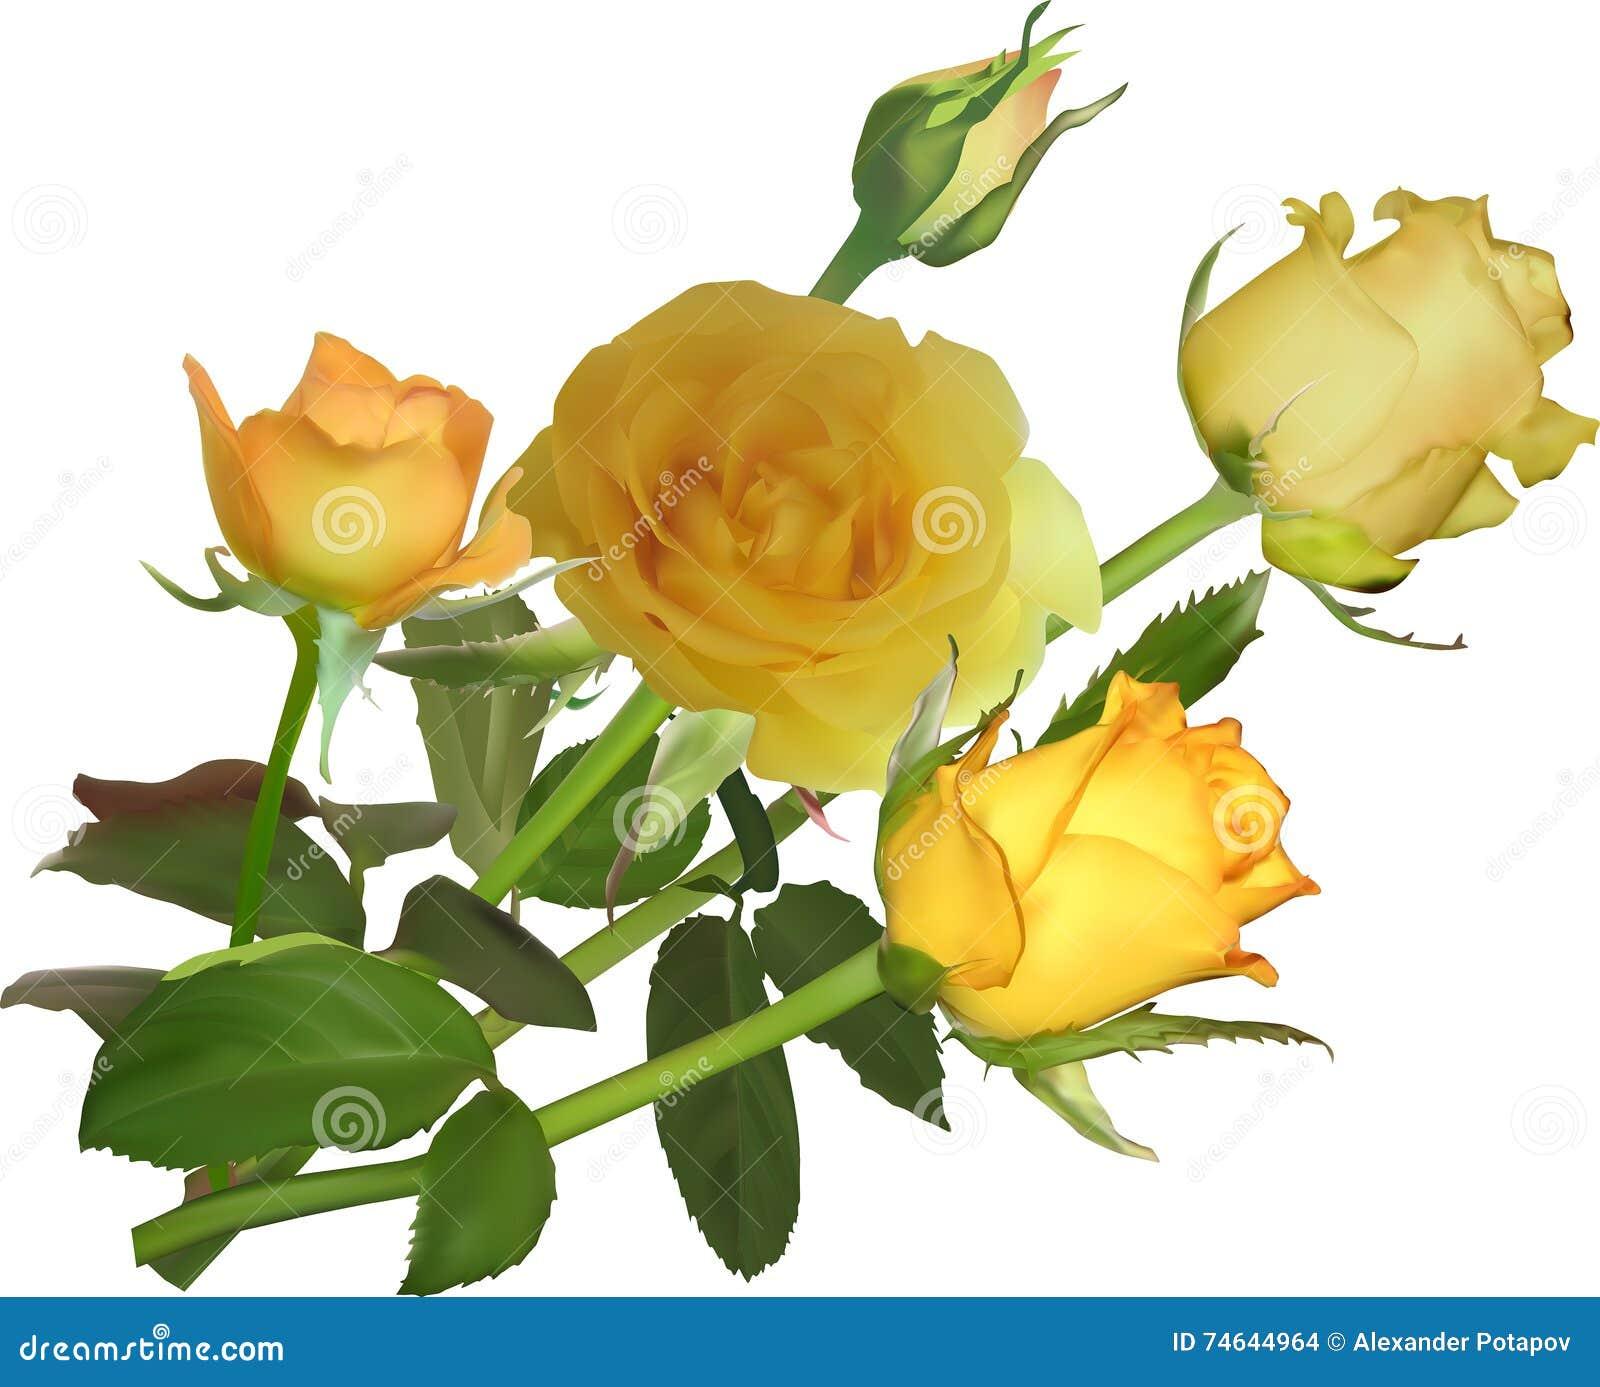 Bunch of five yellow rose flowers stock vector illustration of bunch of five yellow rose flowers mightylinksfo